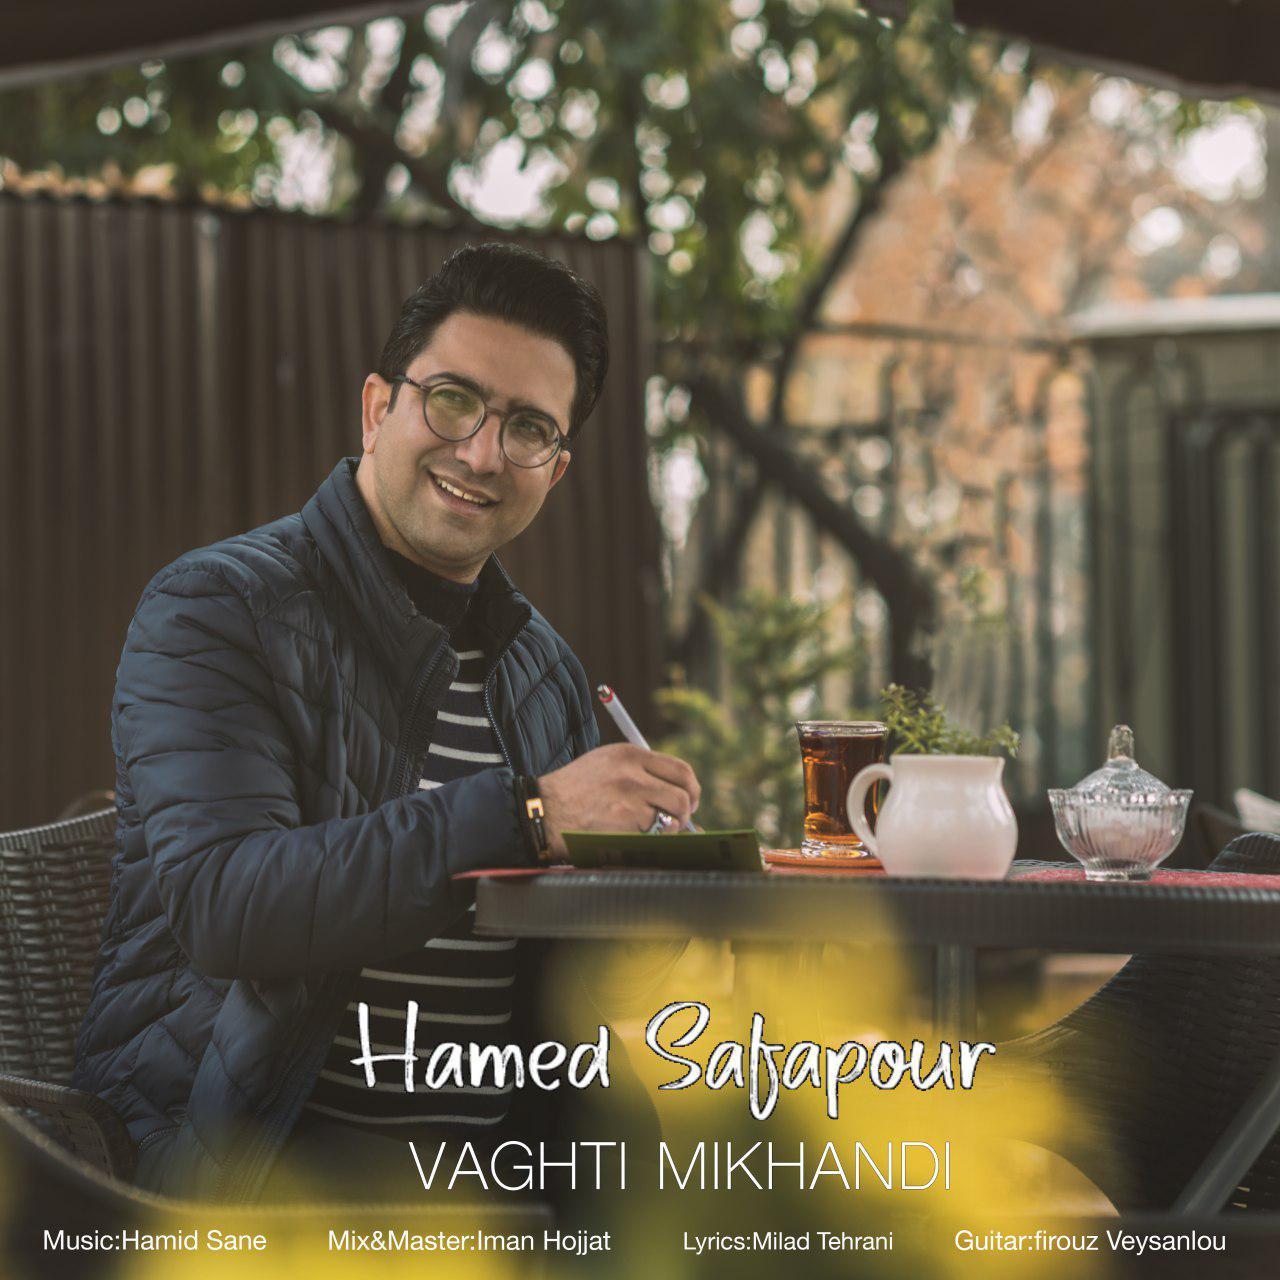 Hamed Safapour – Vaghti Mikhandi